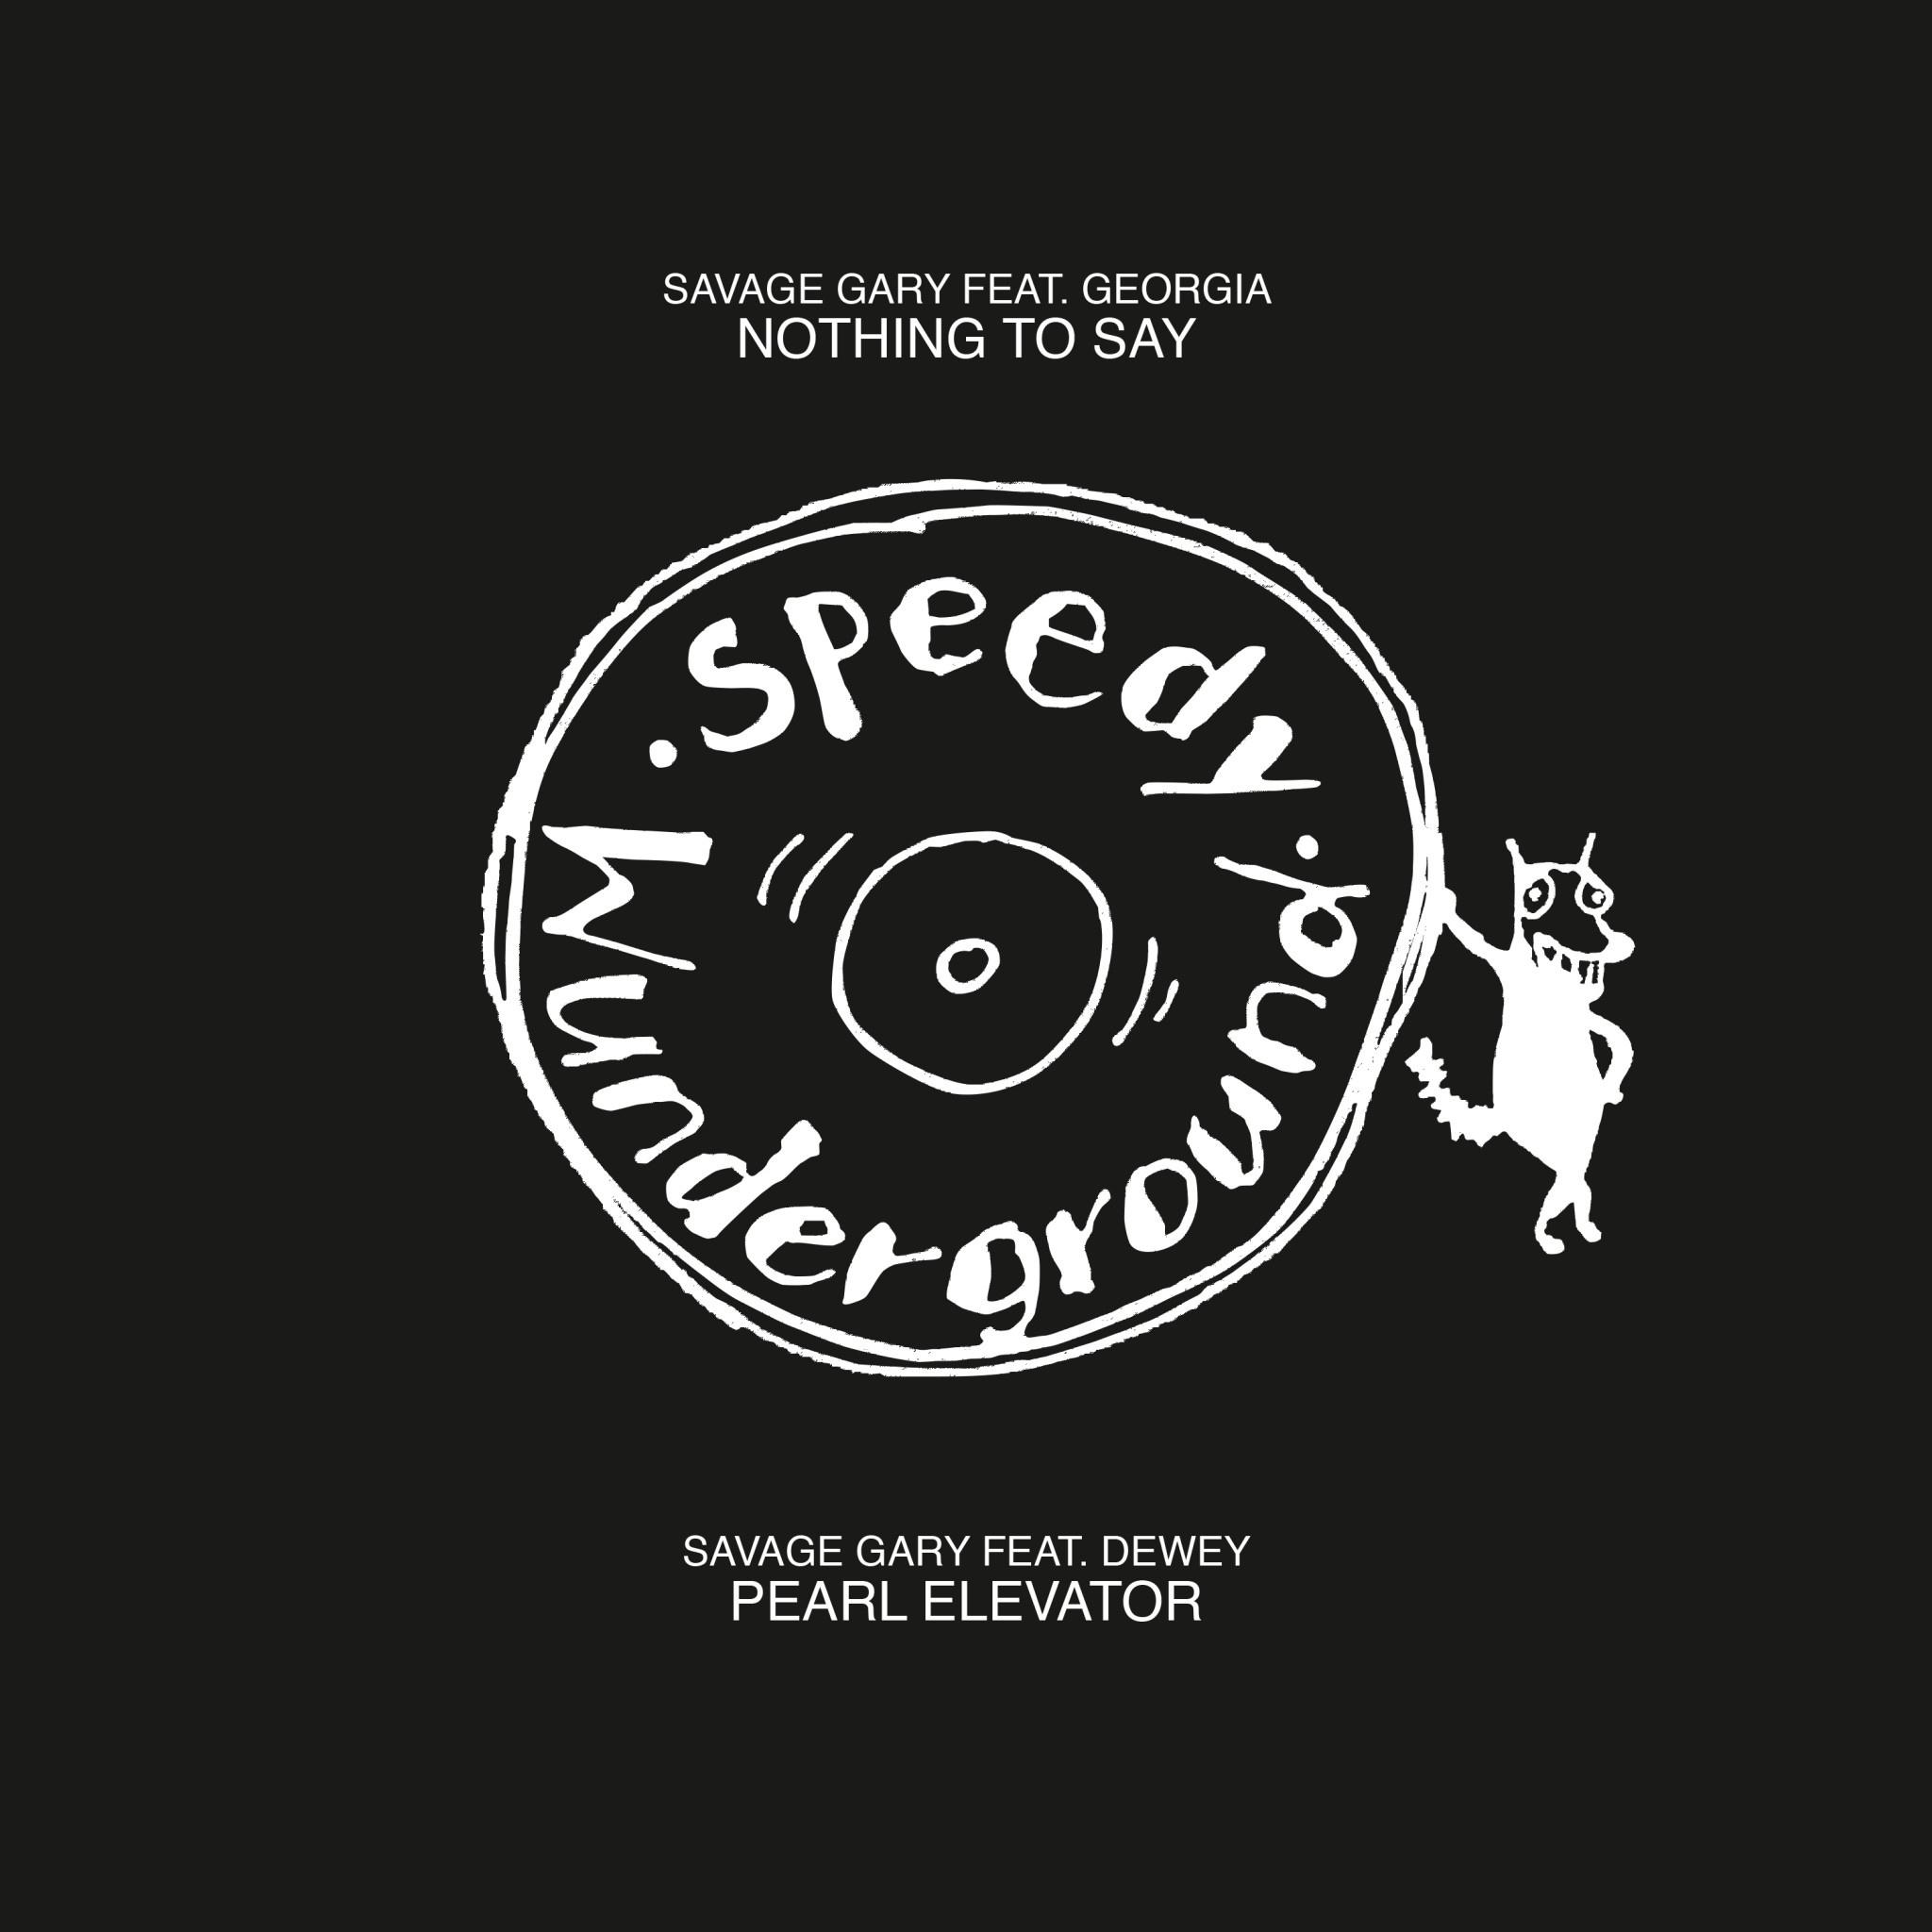 Speedy Wunderground Savage Gary feat. Georgia / Dewley - Quarantine Sampler 3 (LRS 2021)